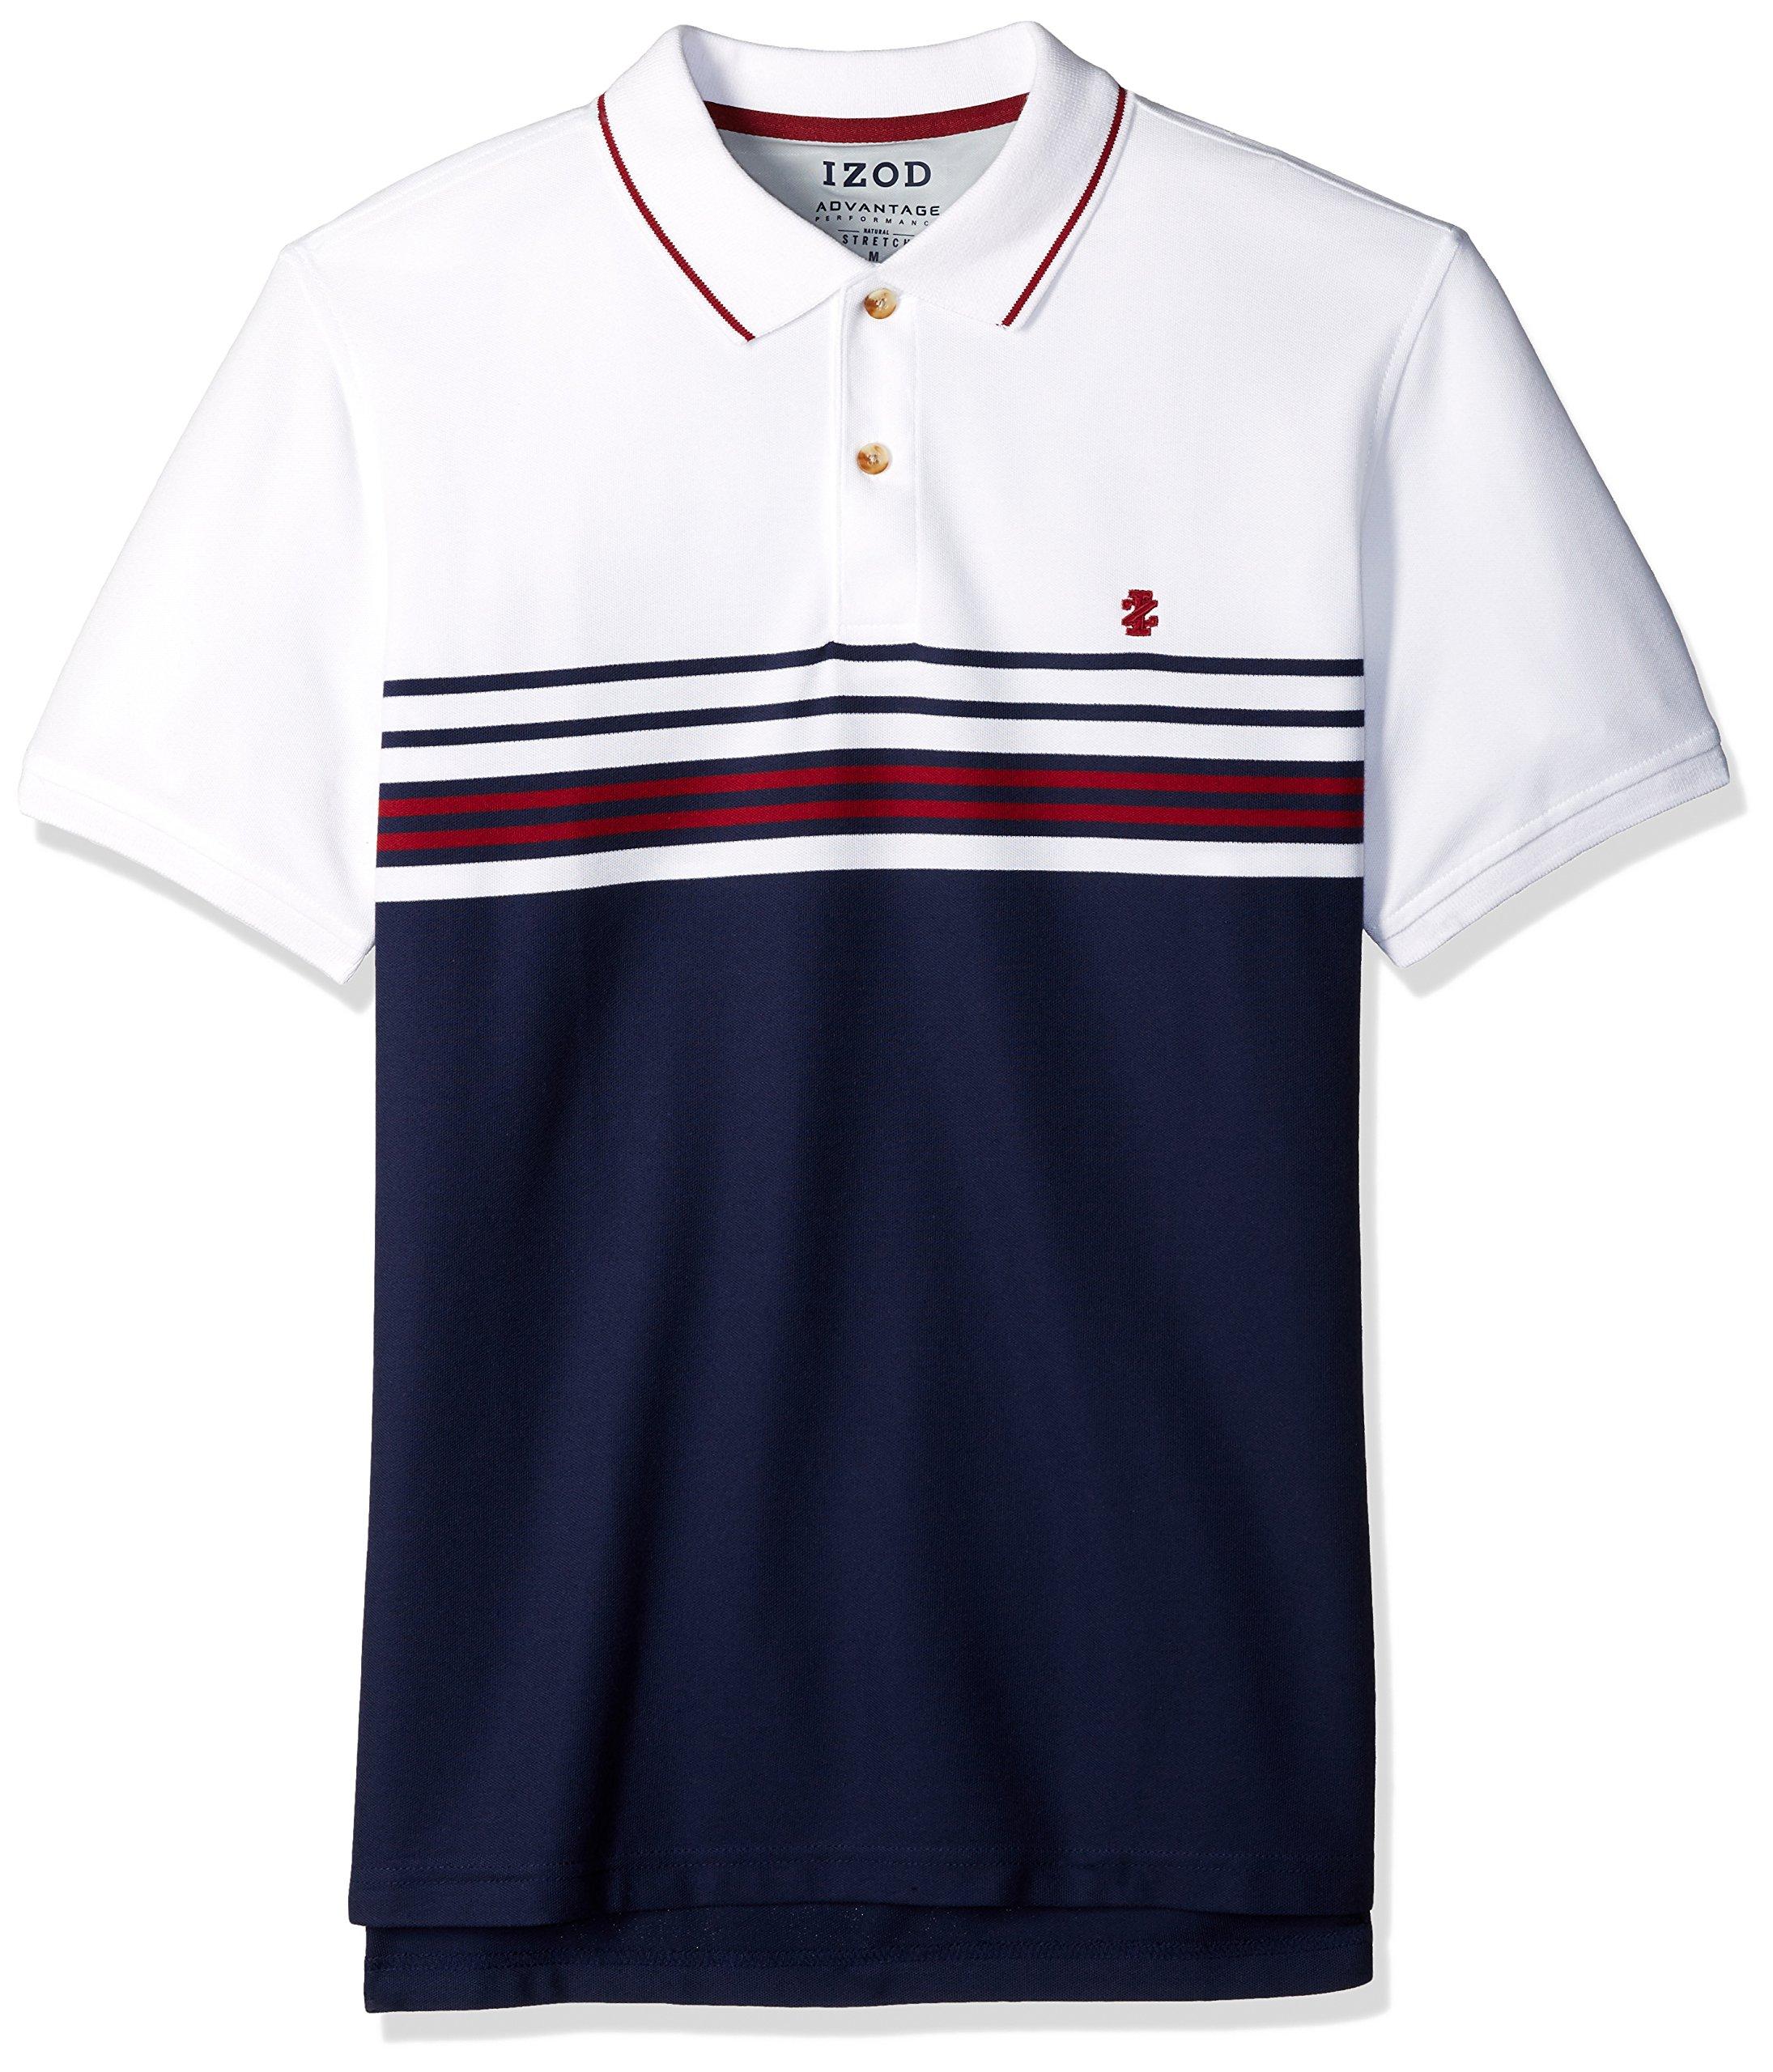 IZOD Men's Advantage Performance Stripe Polo (Regular Slim Fit), Clean Peacoat, Large